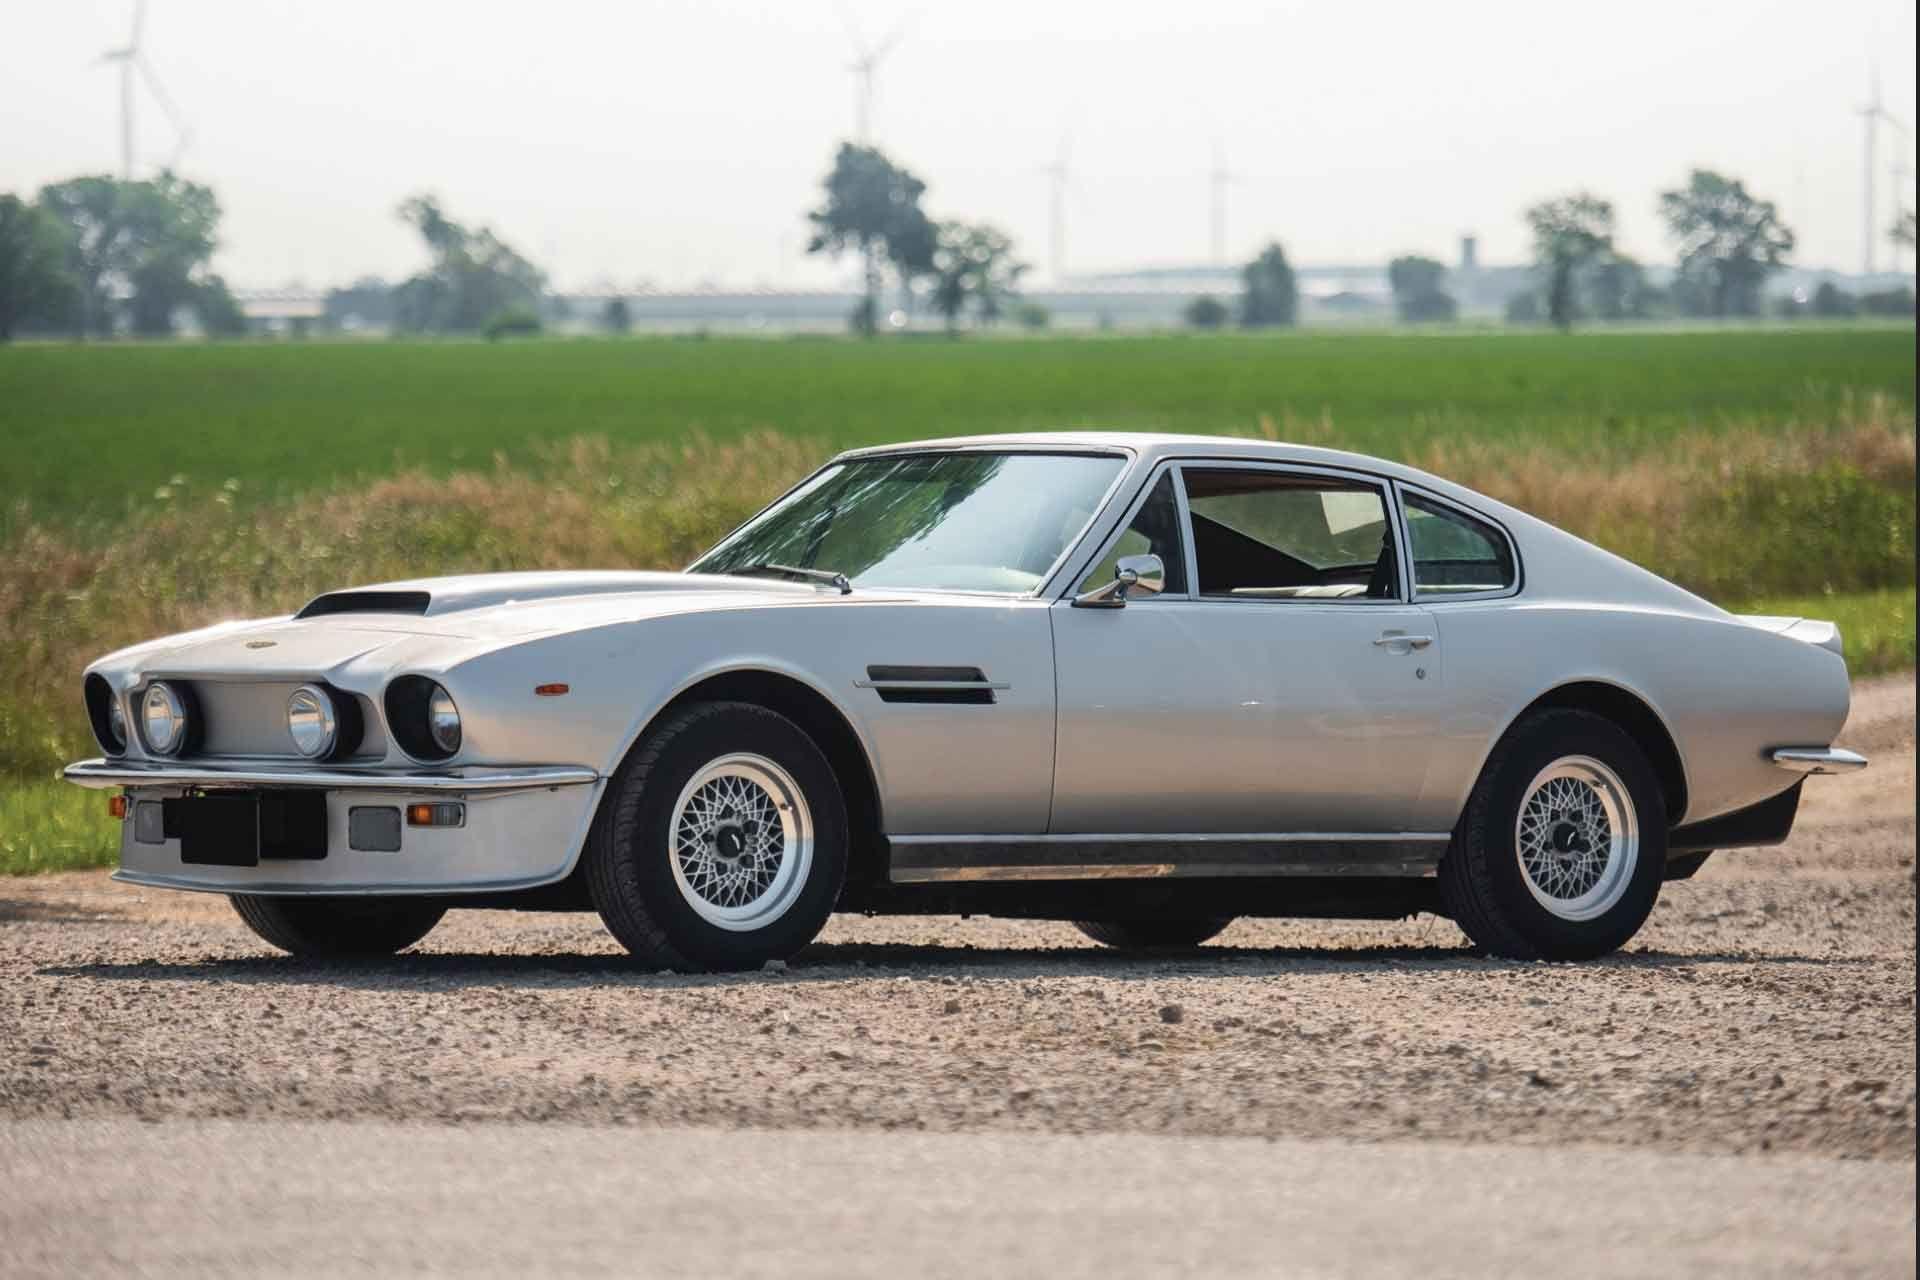 1977 Aston Martin V8 Vantage Coupe | Uncrate